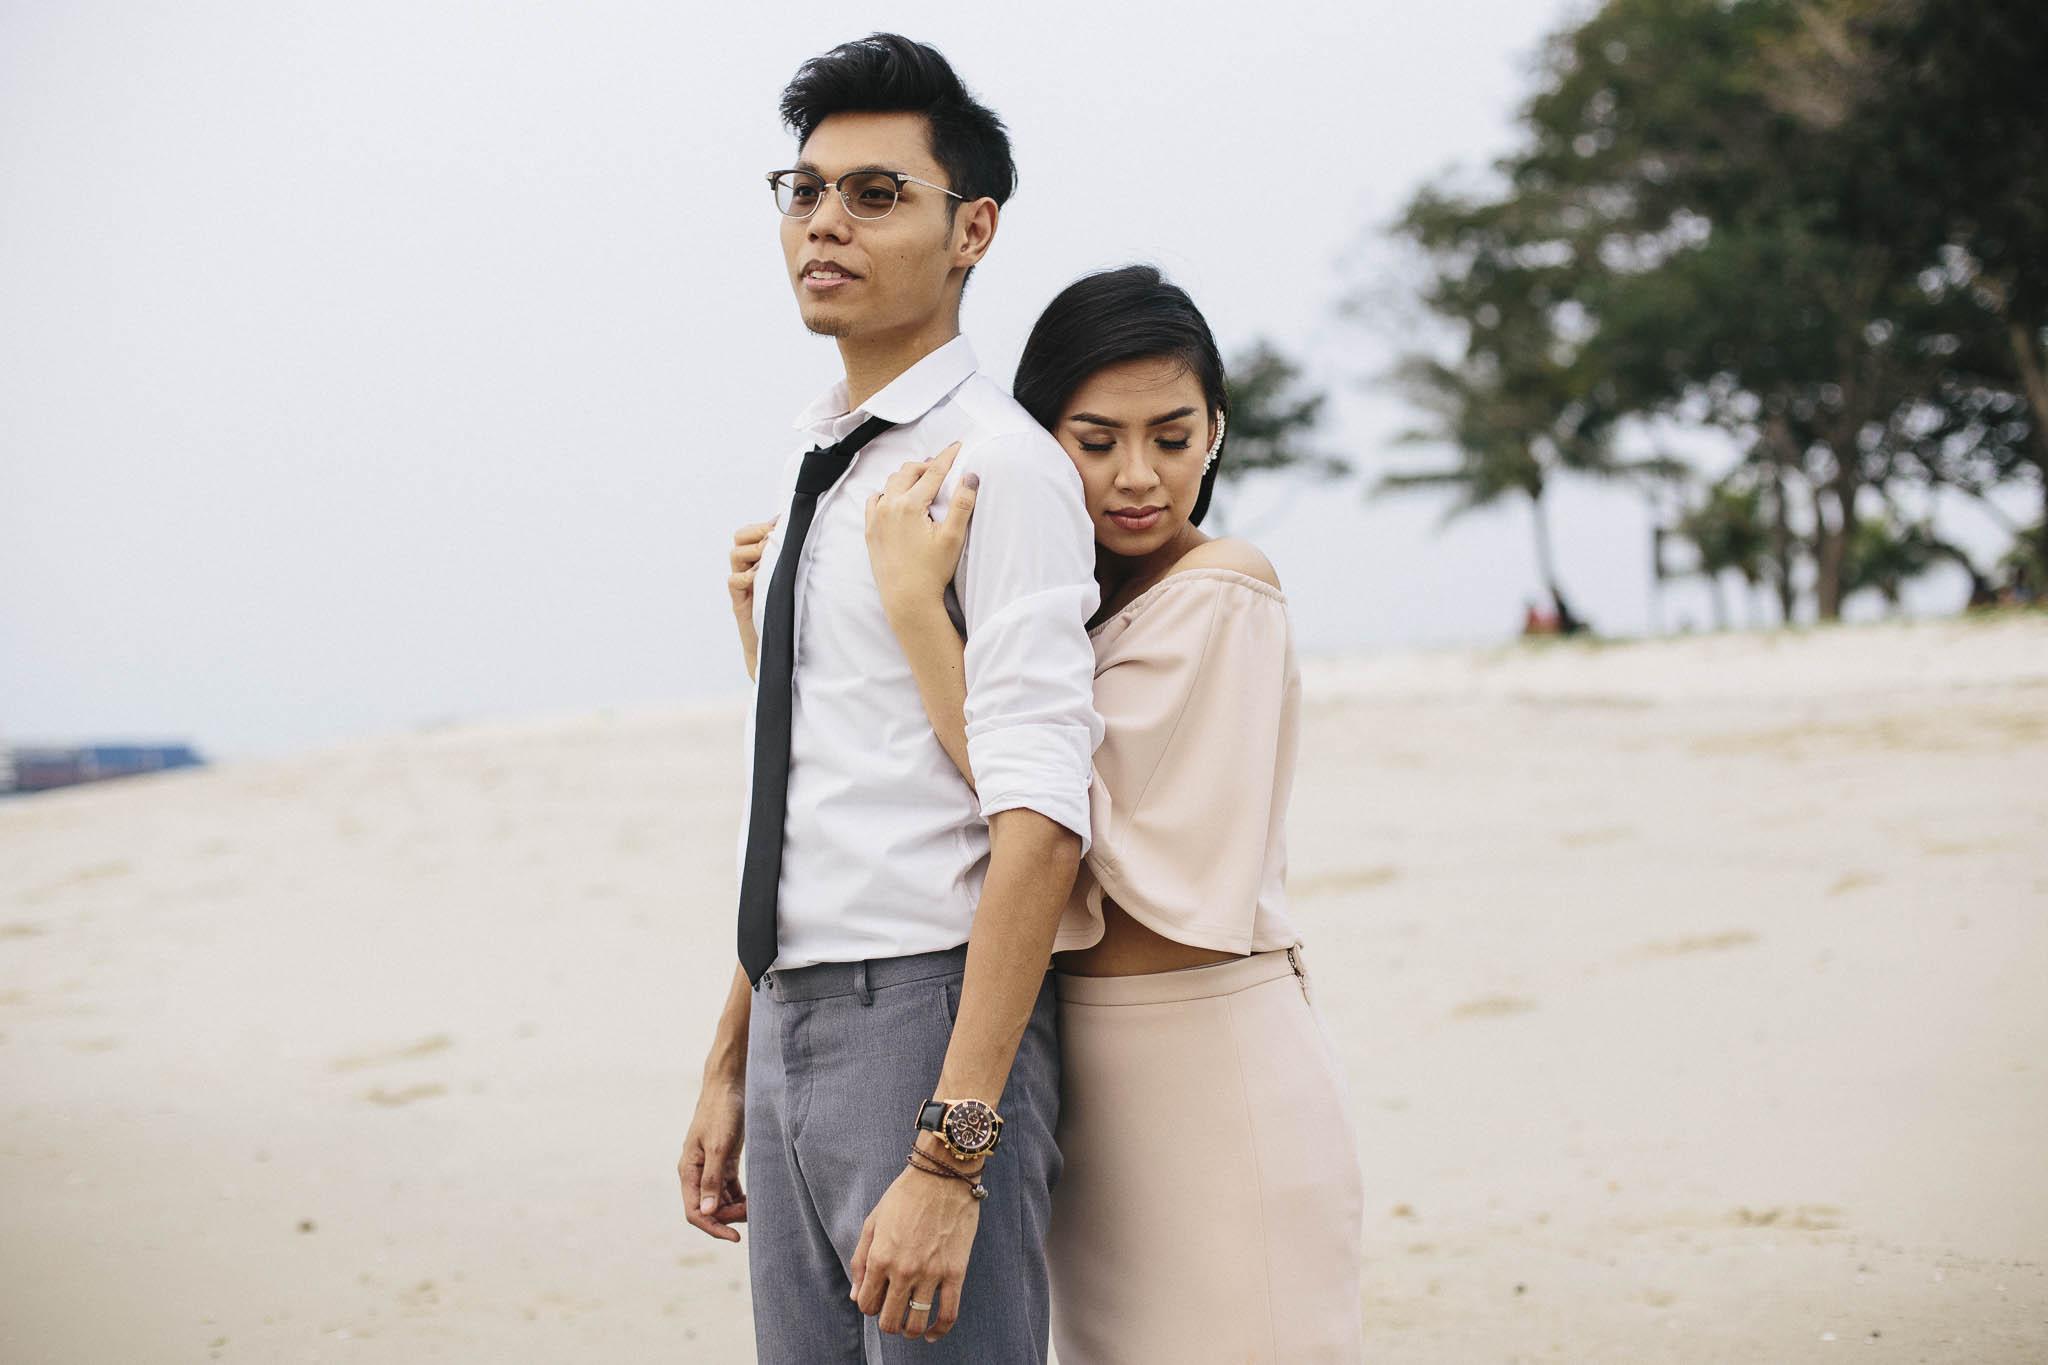 singapore-wedding-photographer-malay-travel-adli-tashah-38.jpg